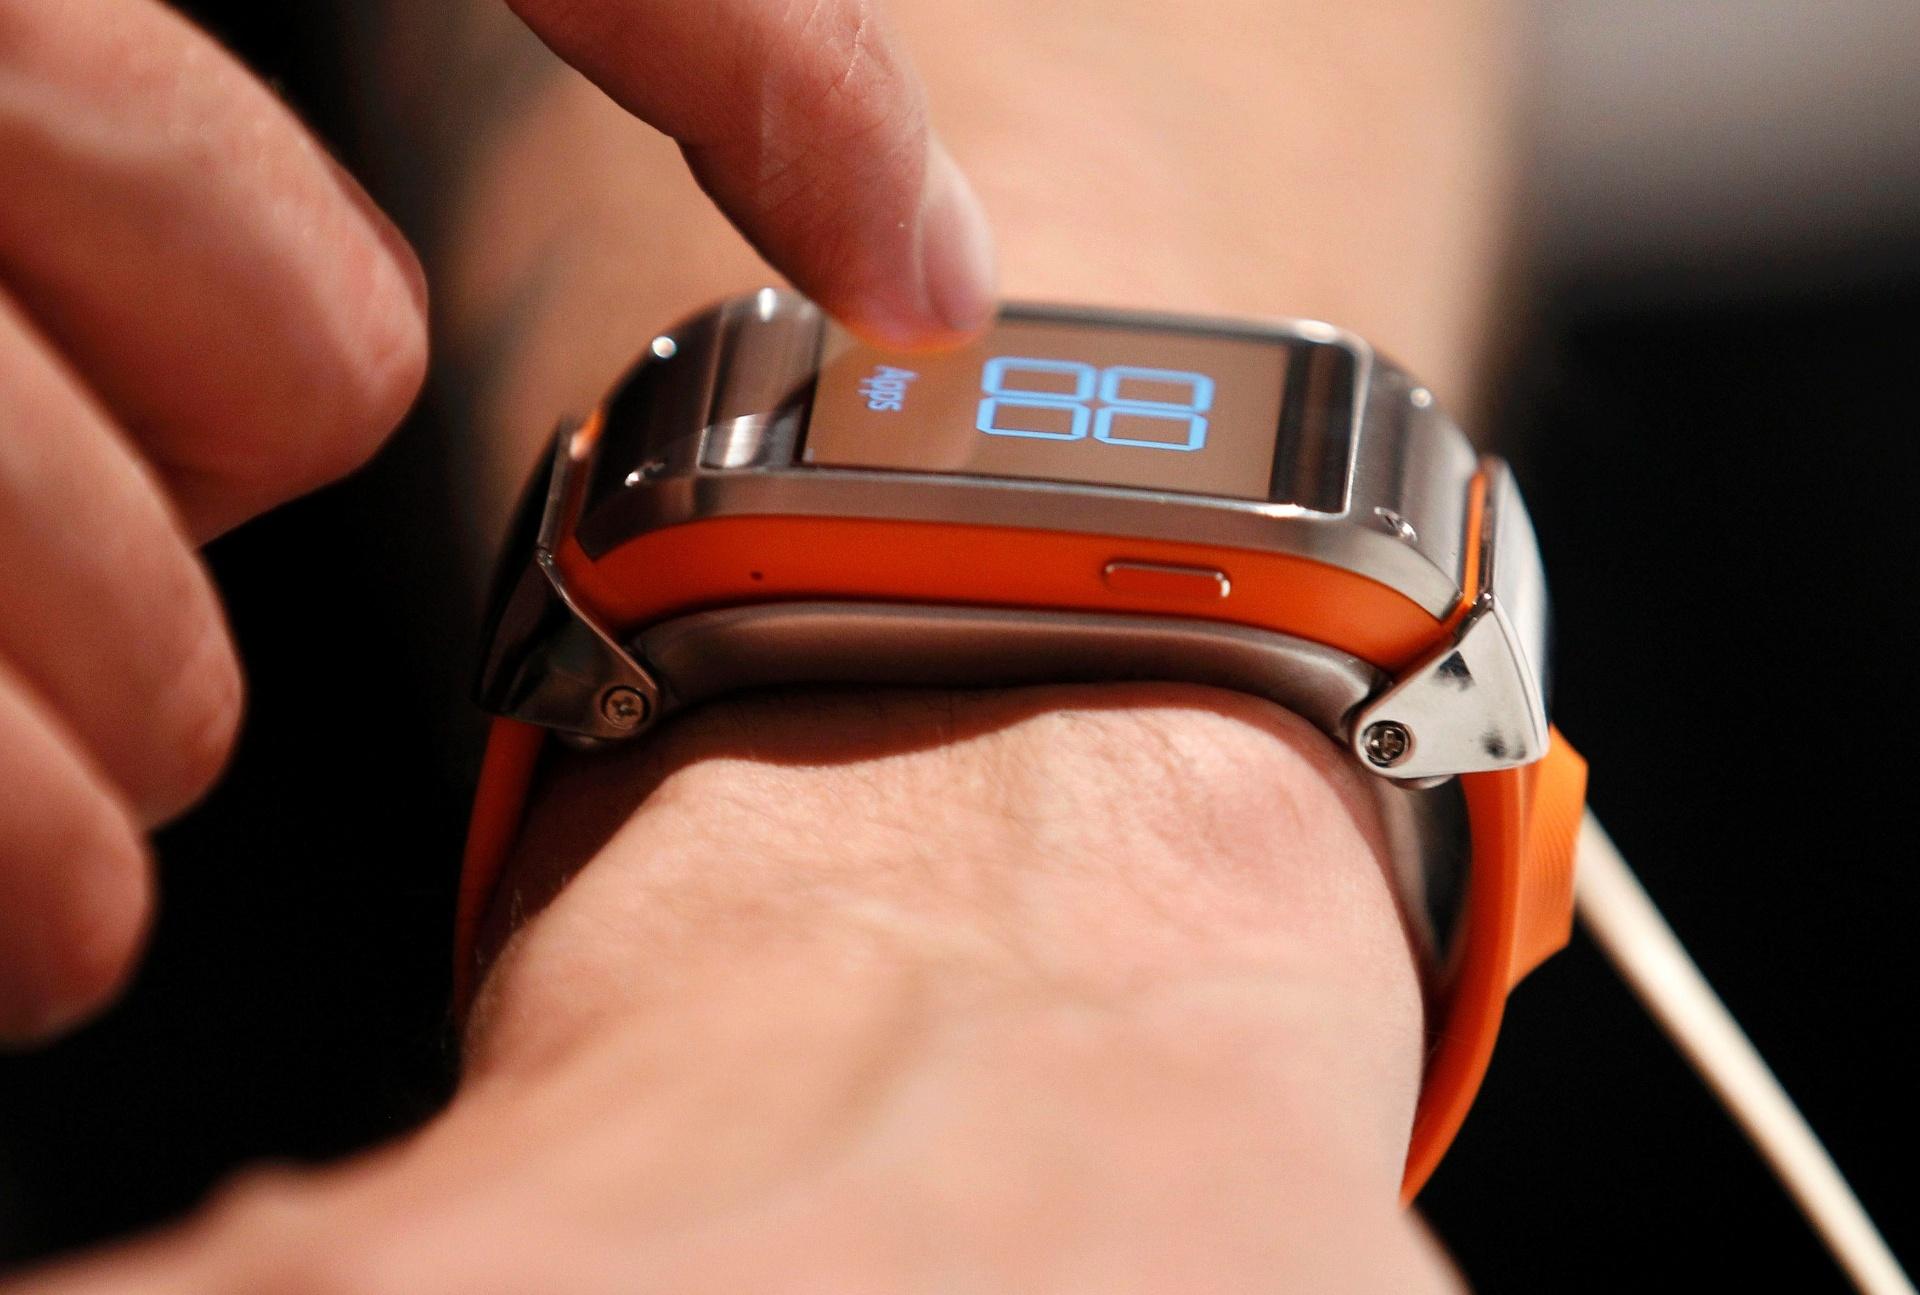 251f95e11a3 Samsung apresenta relógio Galaxy Gear e smartphone Galaxy Note 3 -  04 09 2013 - UOL Tecnologia